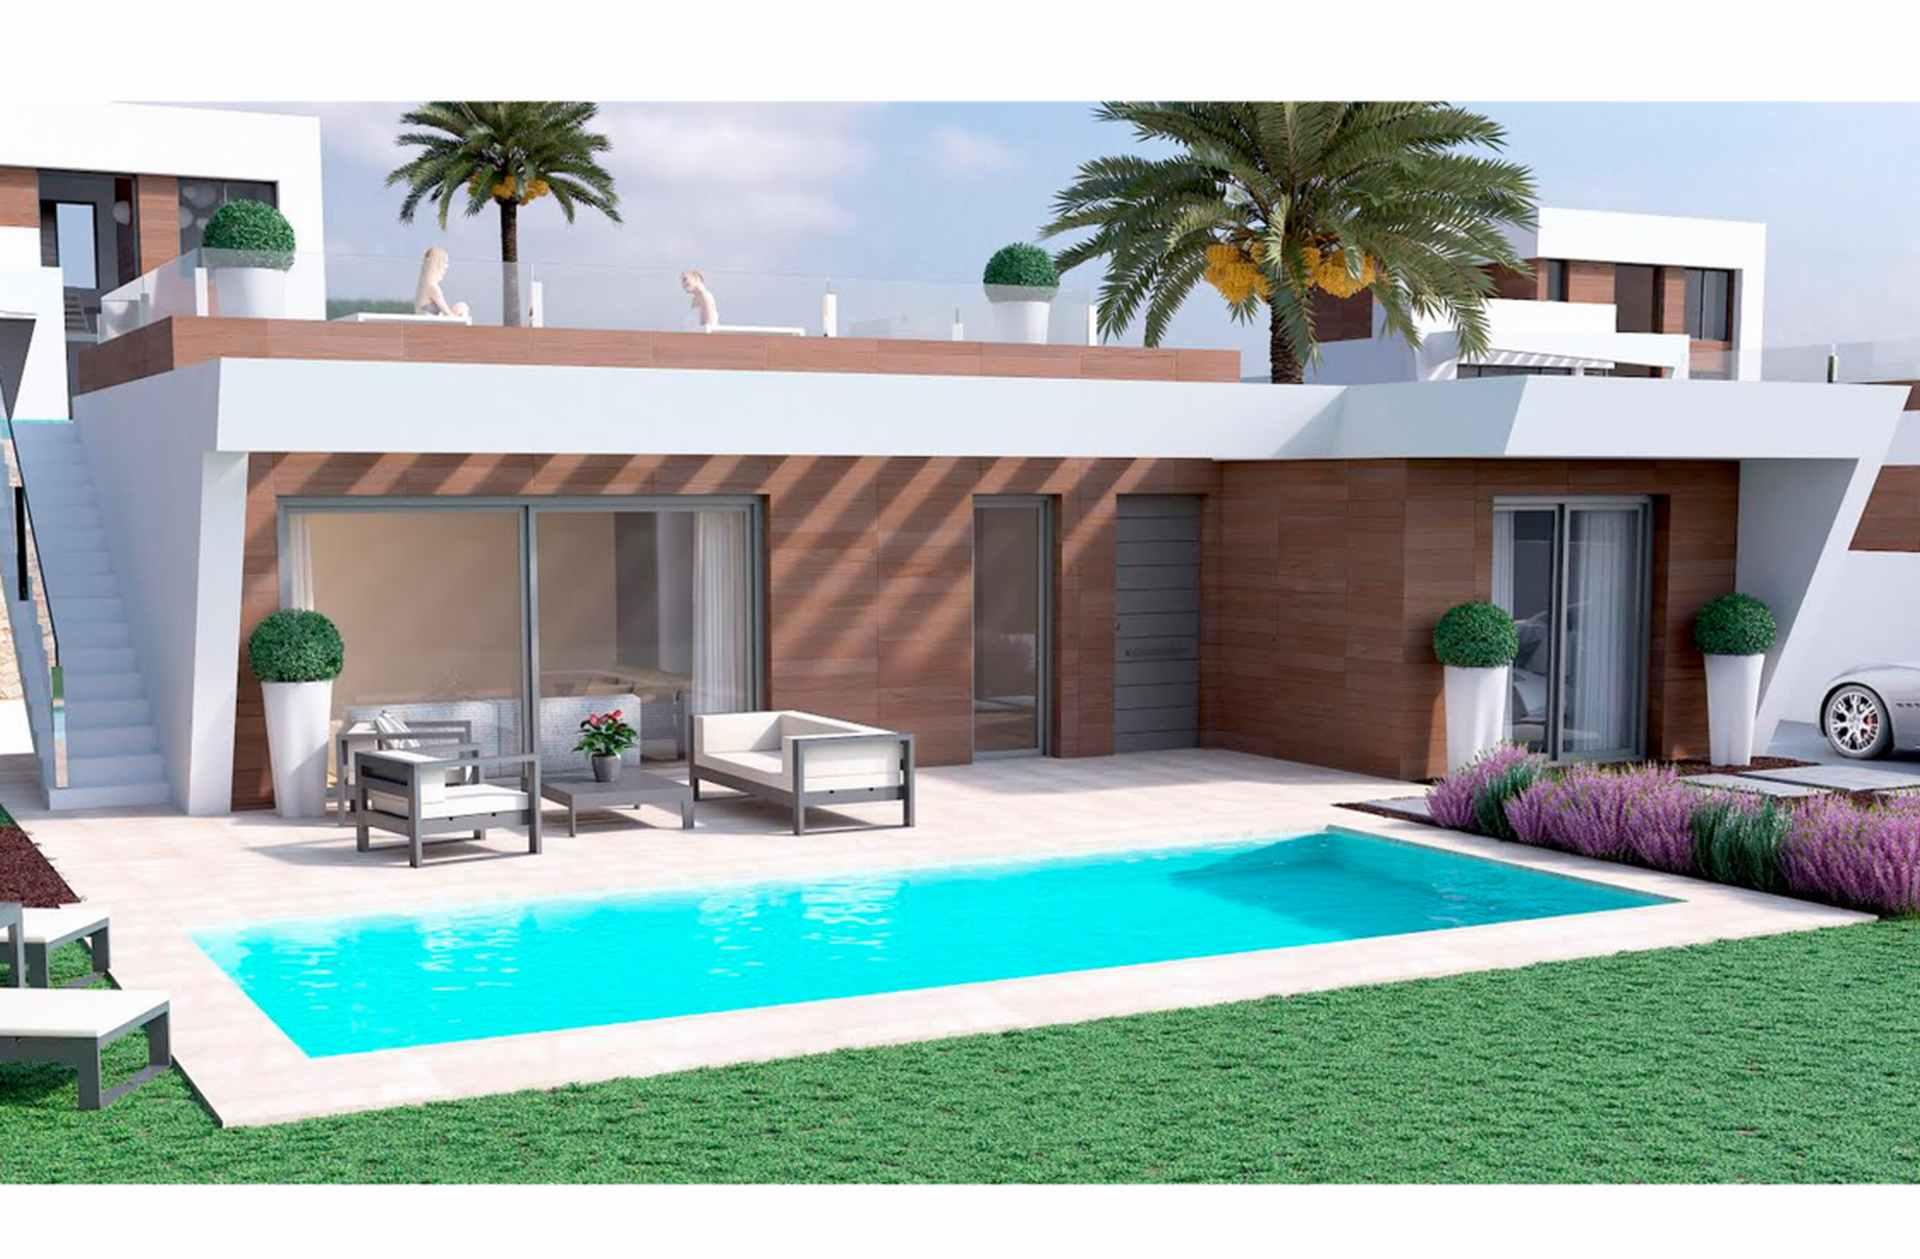 villa-aqua-property-for-sale-benidorm-campana-garden